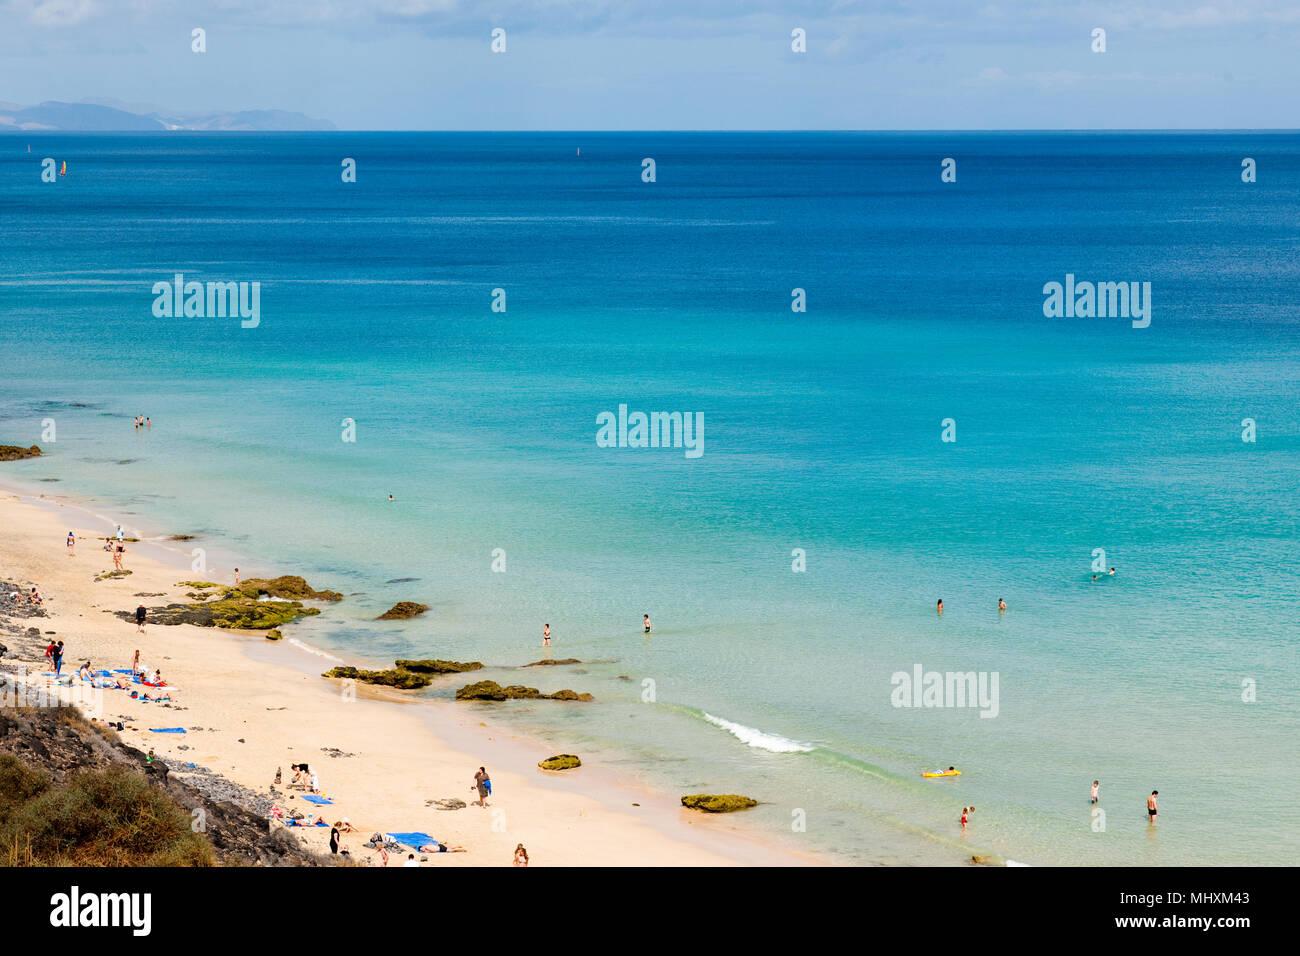 beach, Fuerteventura, Canary Islands, Spain, Europe, Atlantic / Fuerteventura | Strand, Fuerteventura, Kanarische Inseln, Kanaren, Spanien, Europa, At Stock Photo